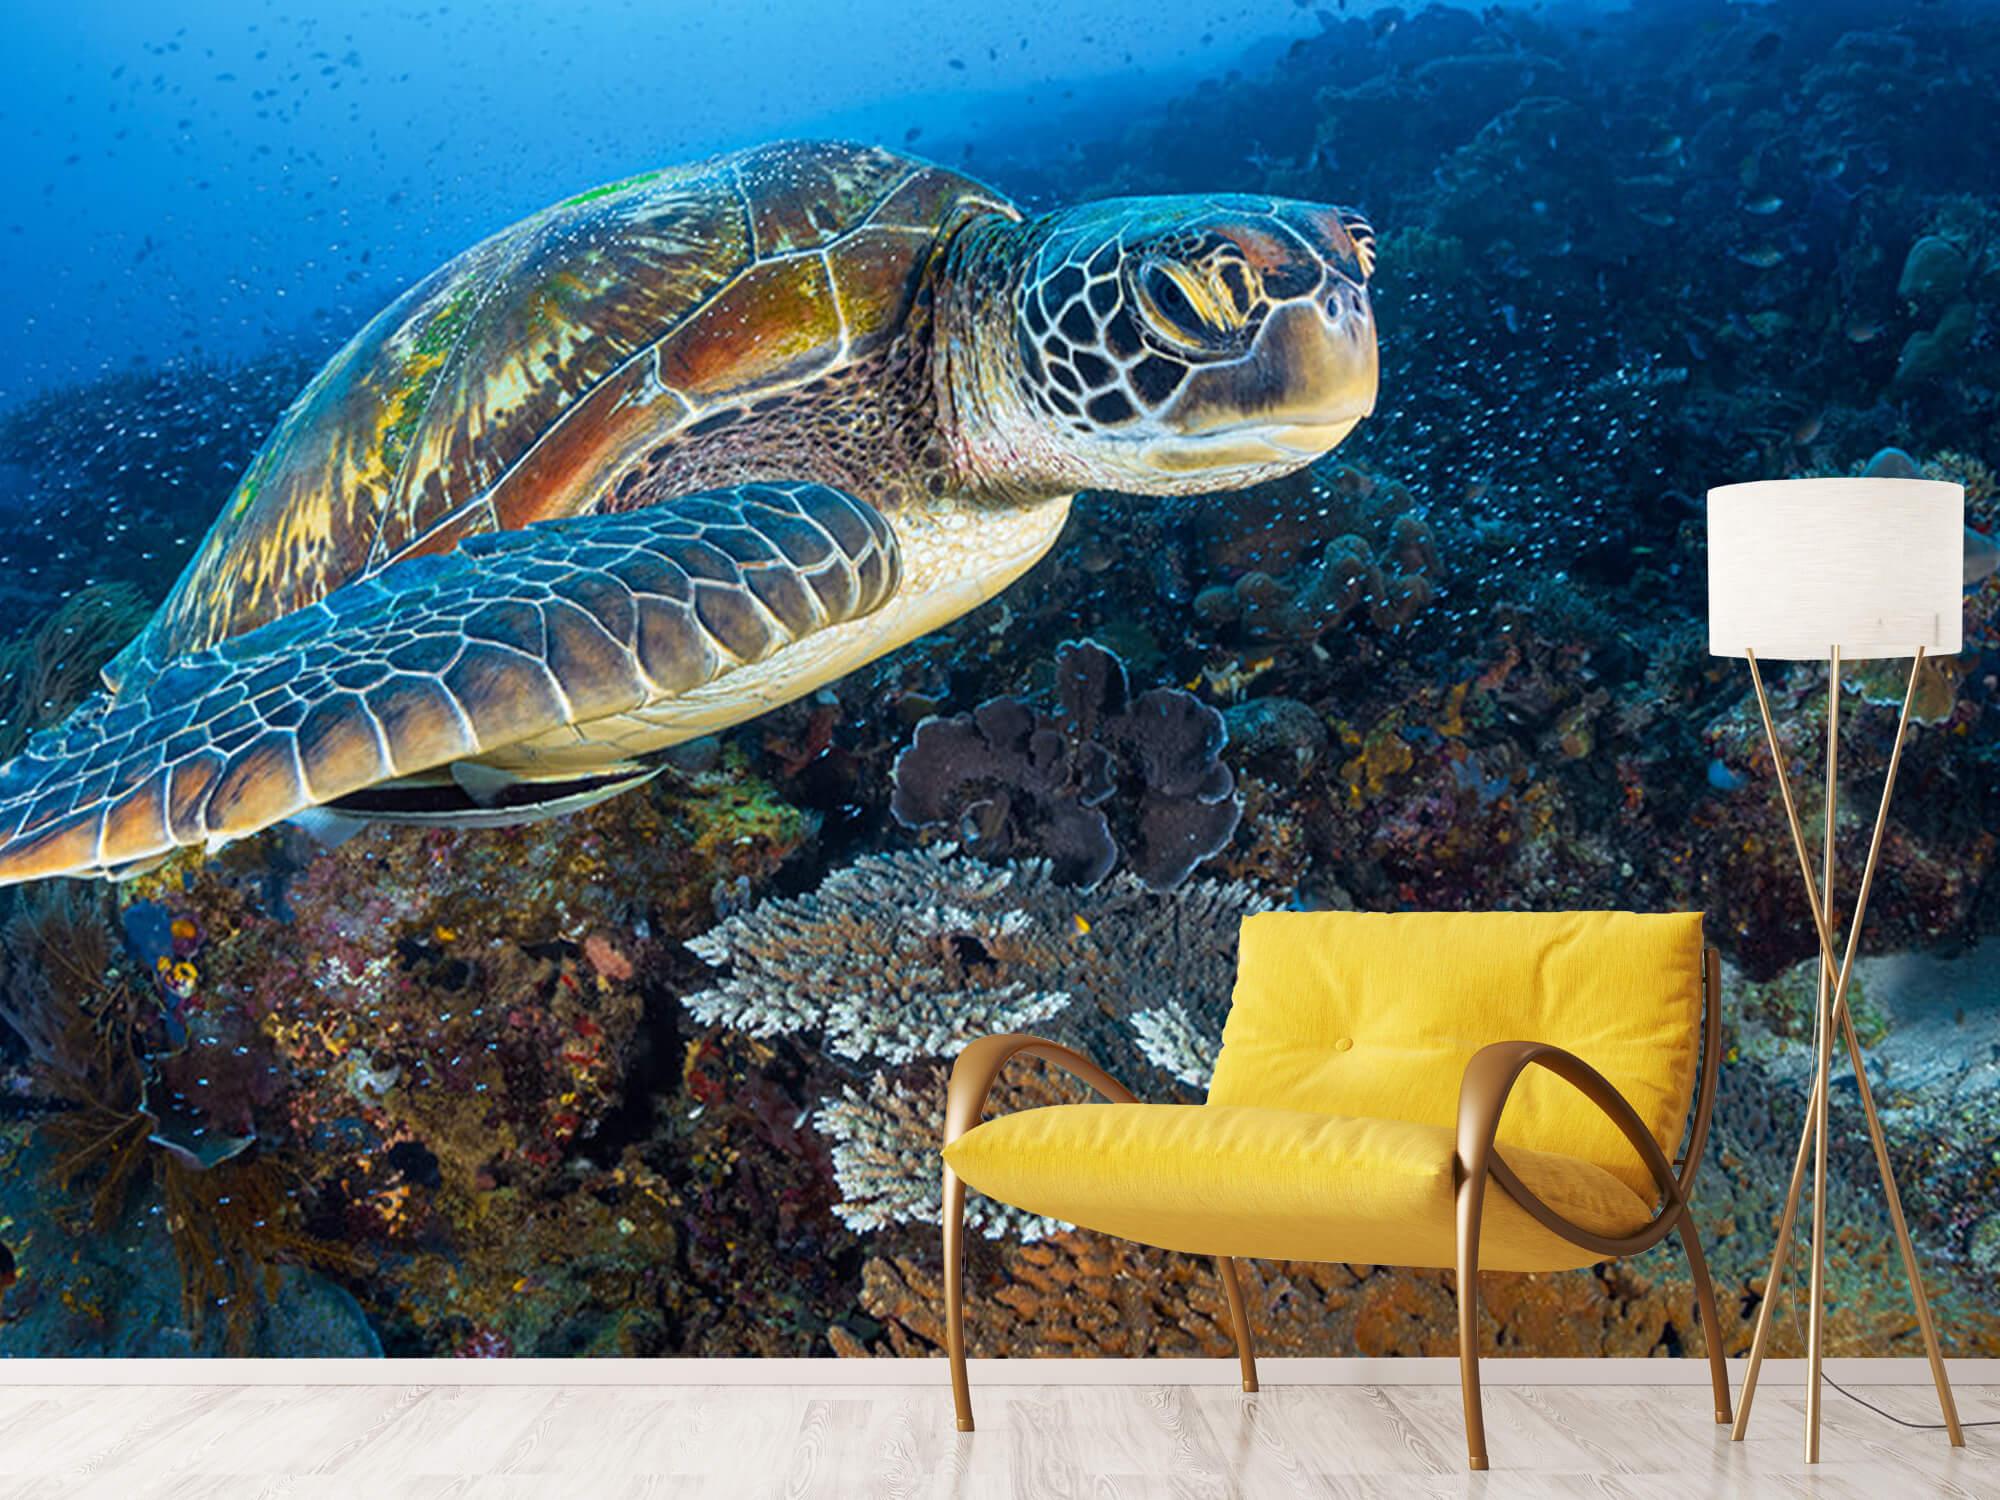 Green sea turtle from Raja Ampat 9